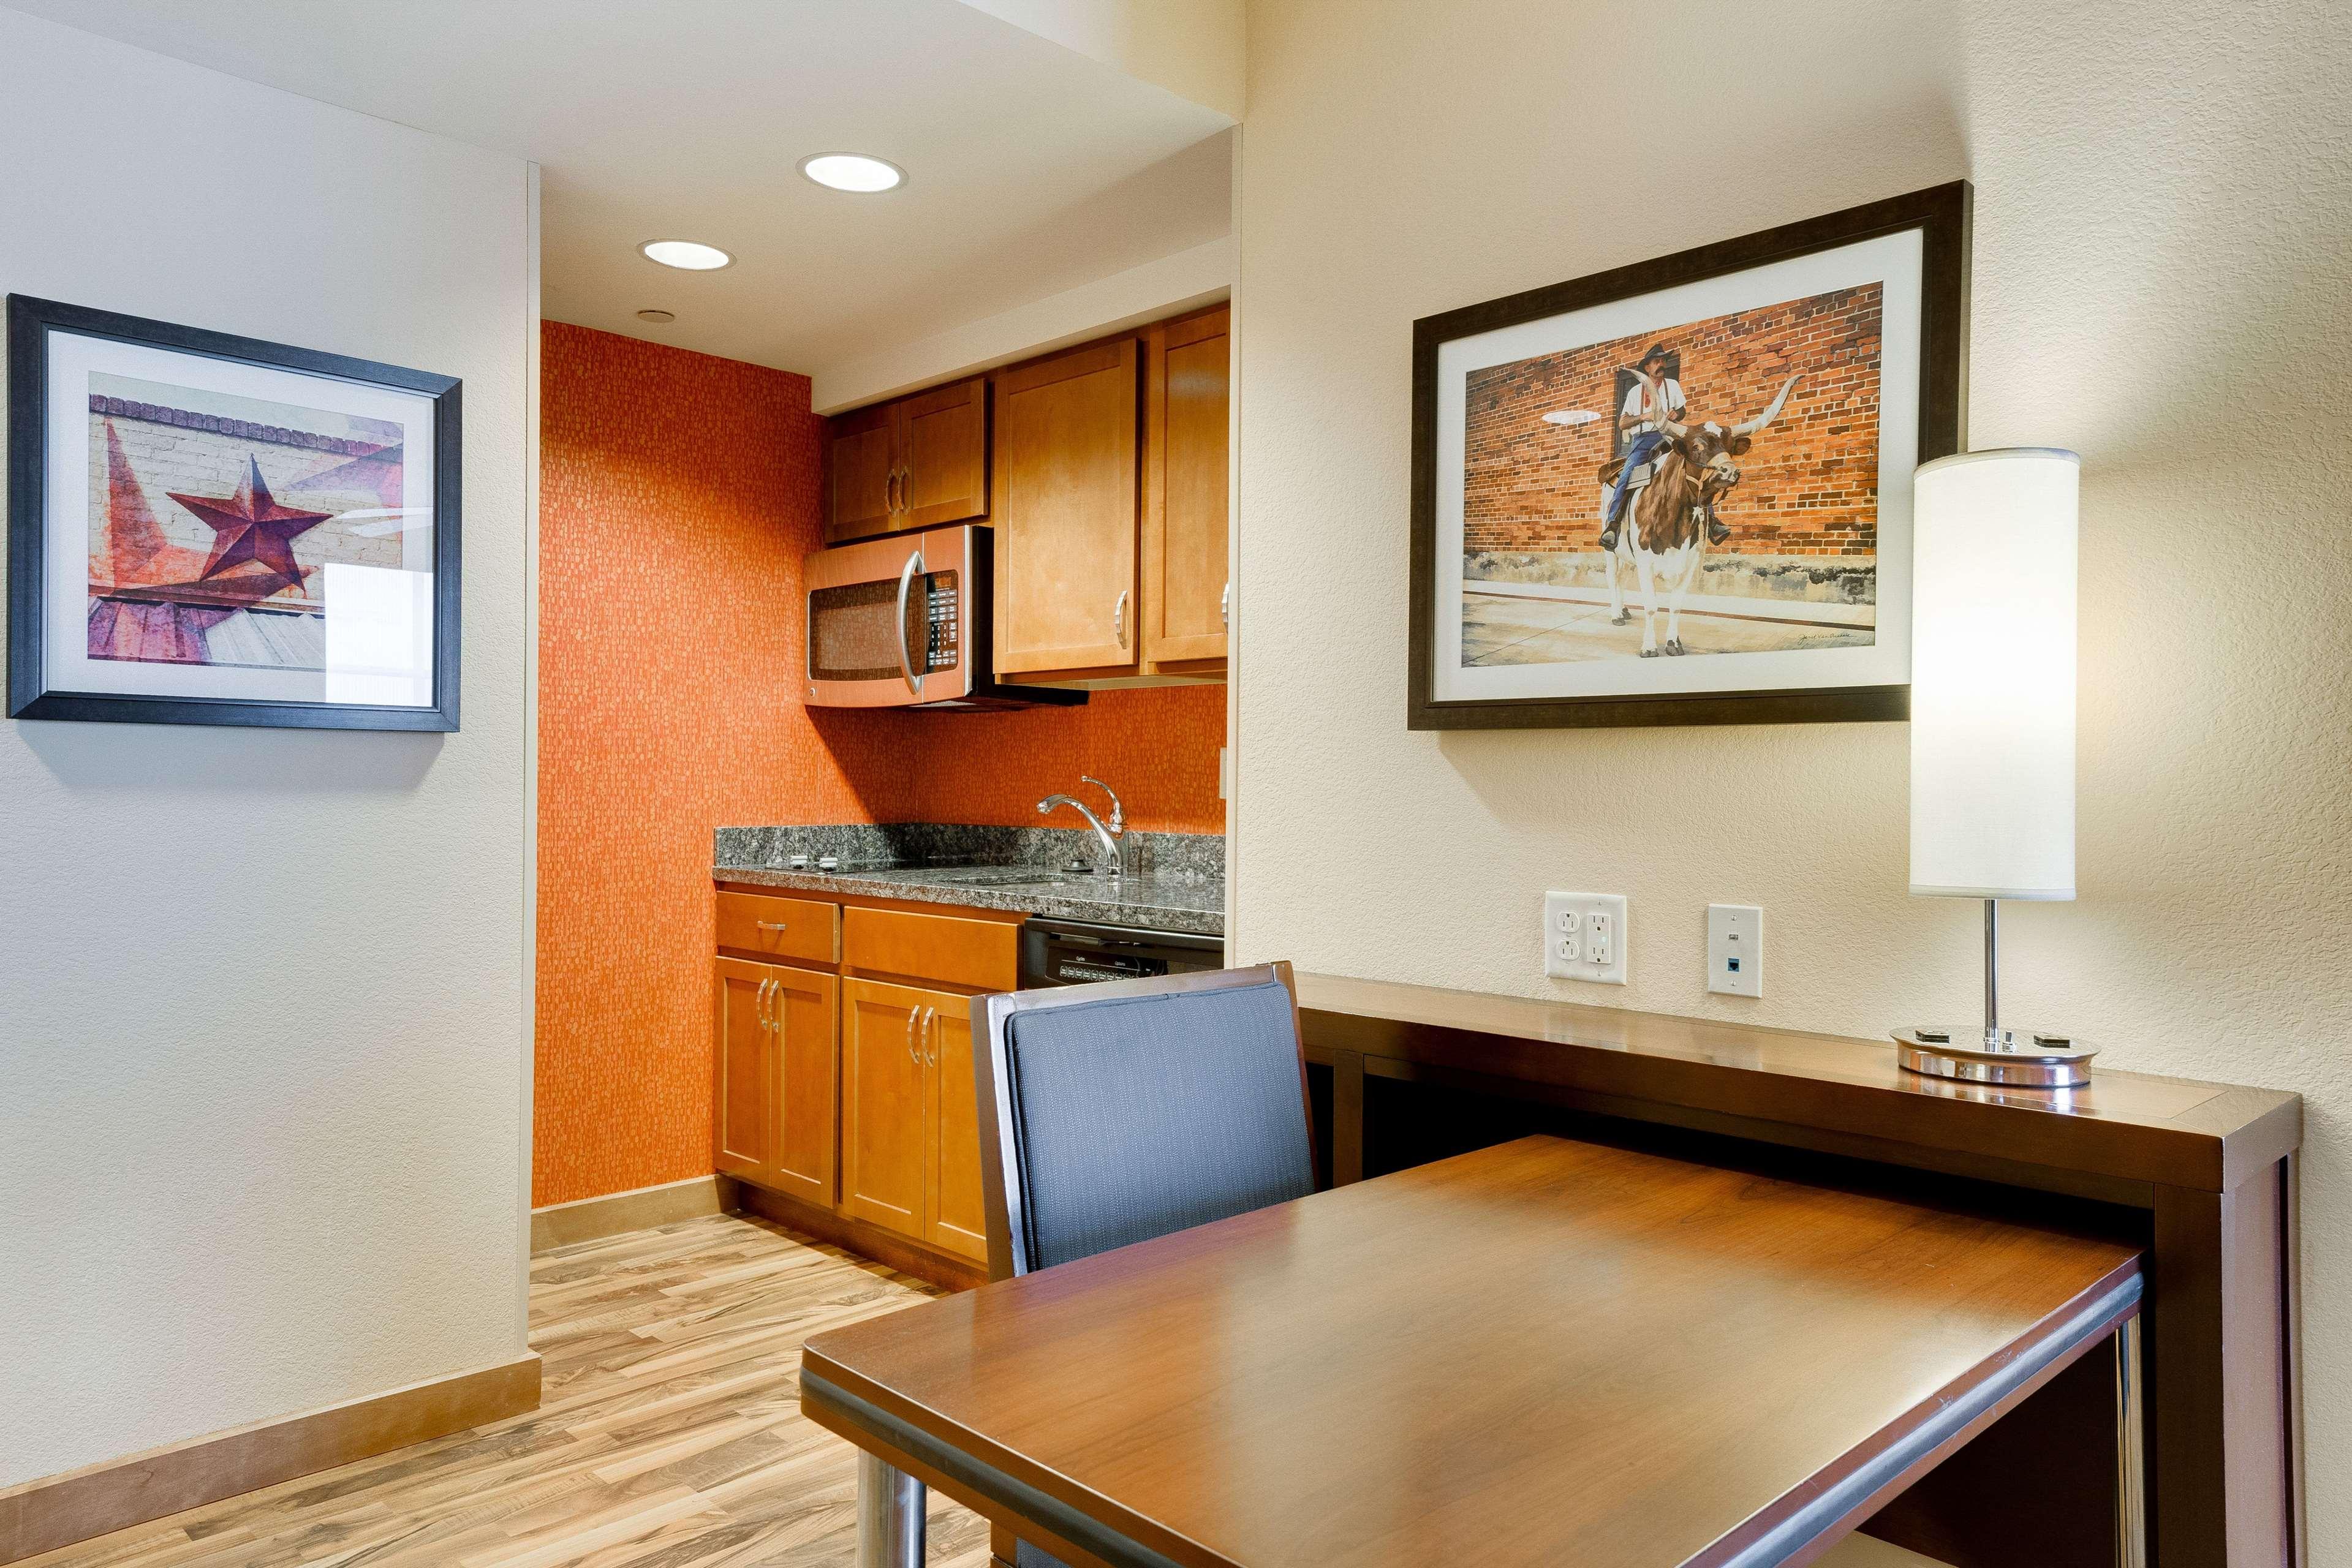 Homewood Suites by Hilton Fort Worth - Medical Center, TX image 11